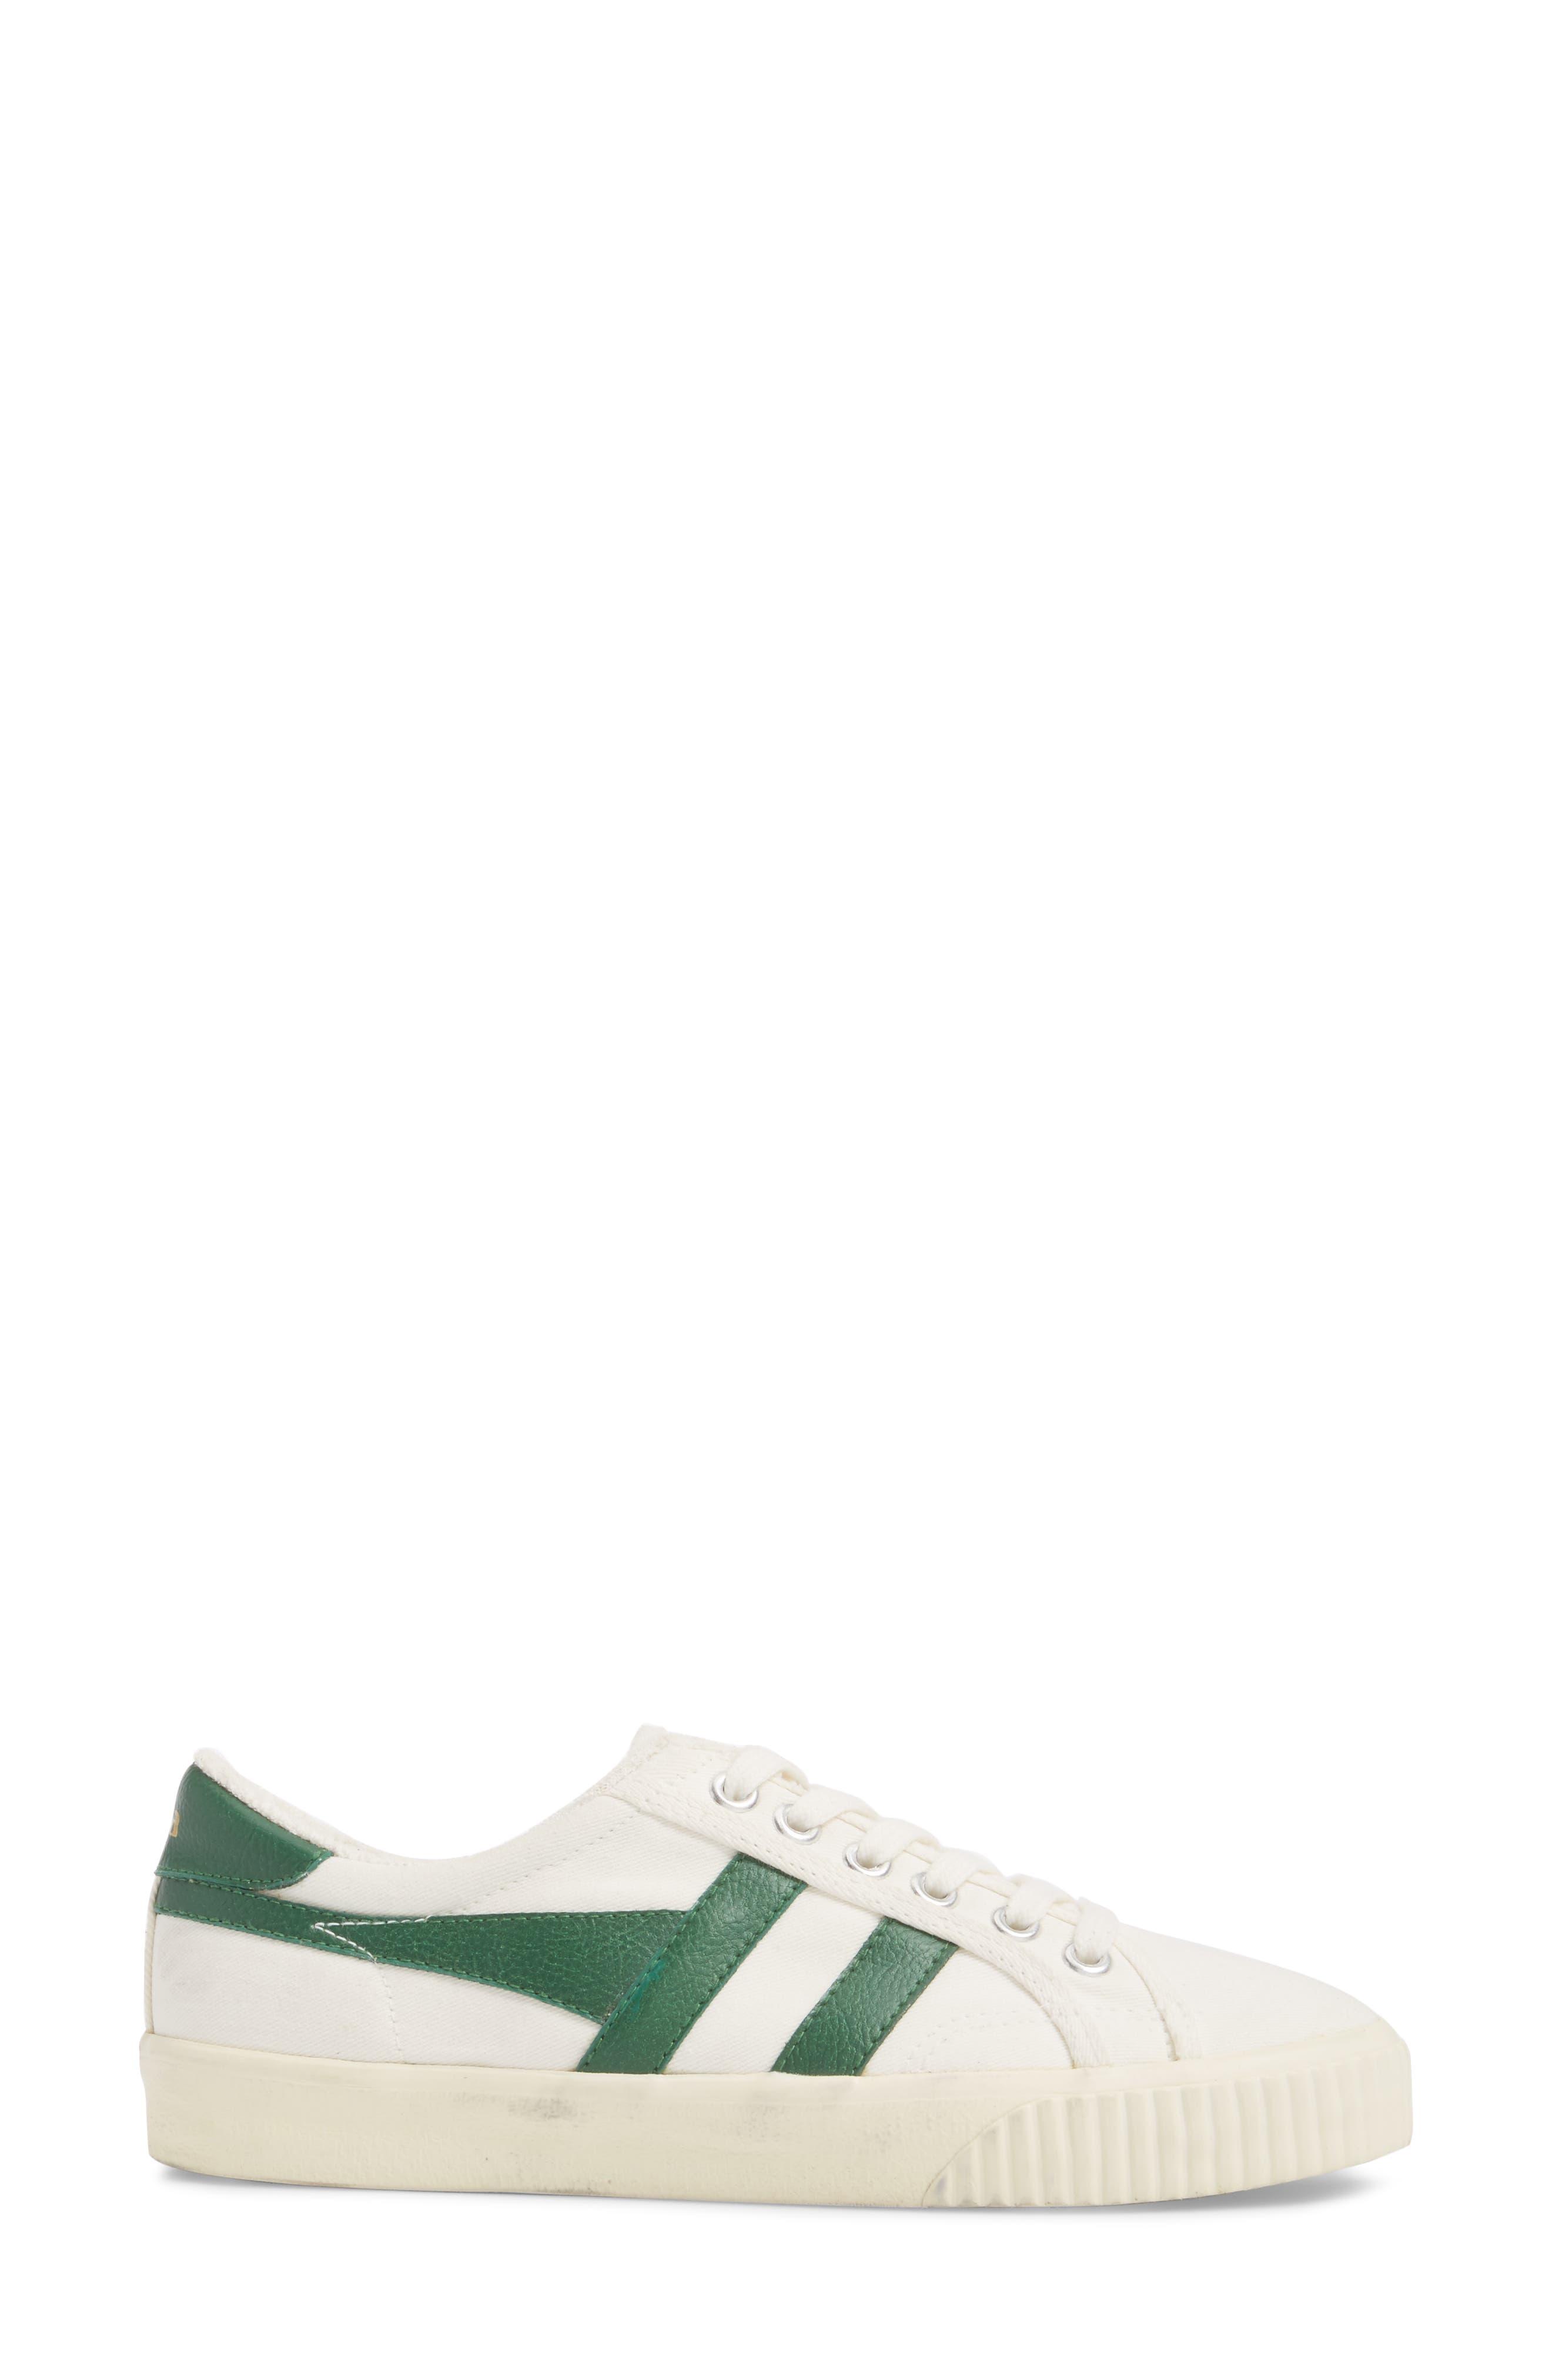 Tennis Mark Cox Sneaker,                             Alternate thumbnail 3, color,                             Off White/ Green